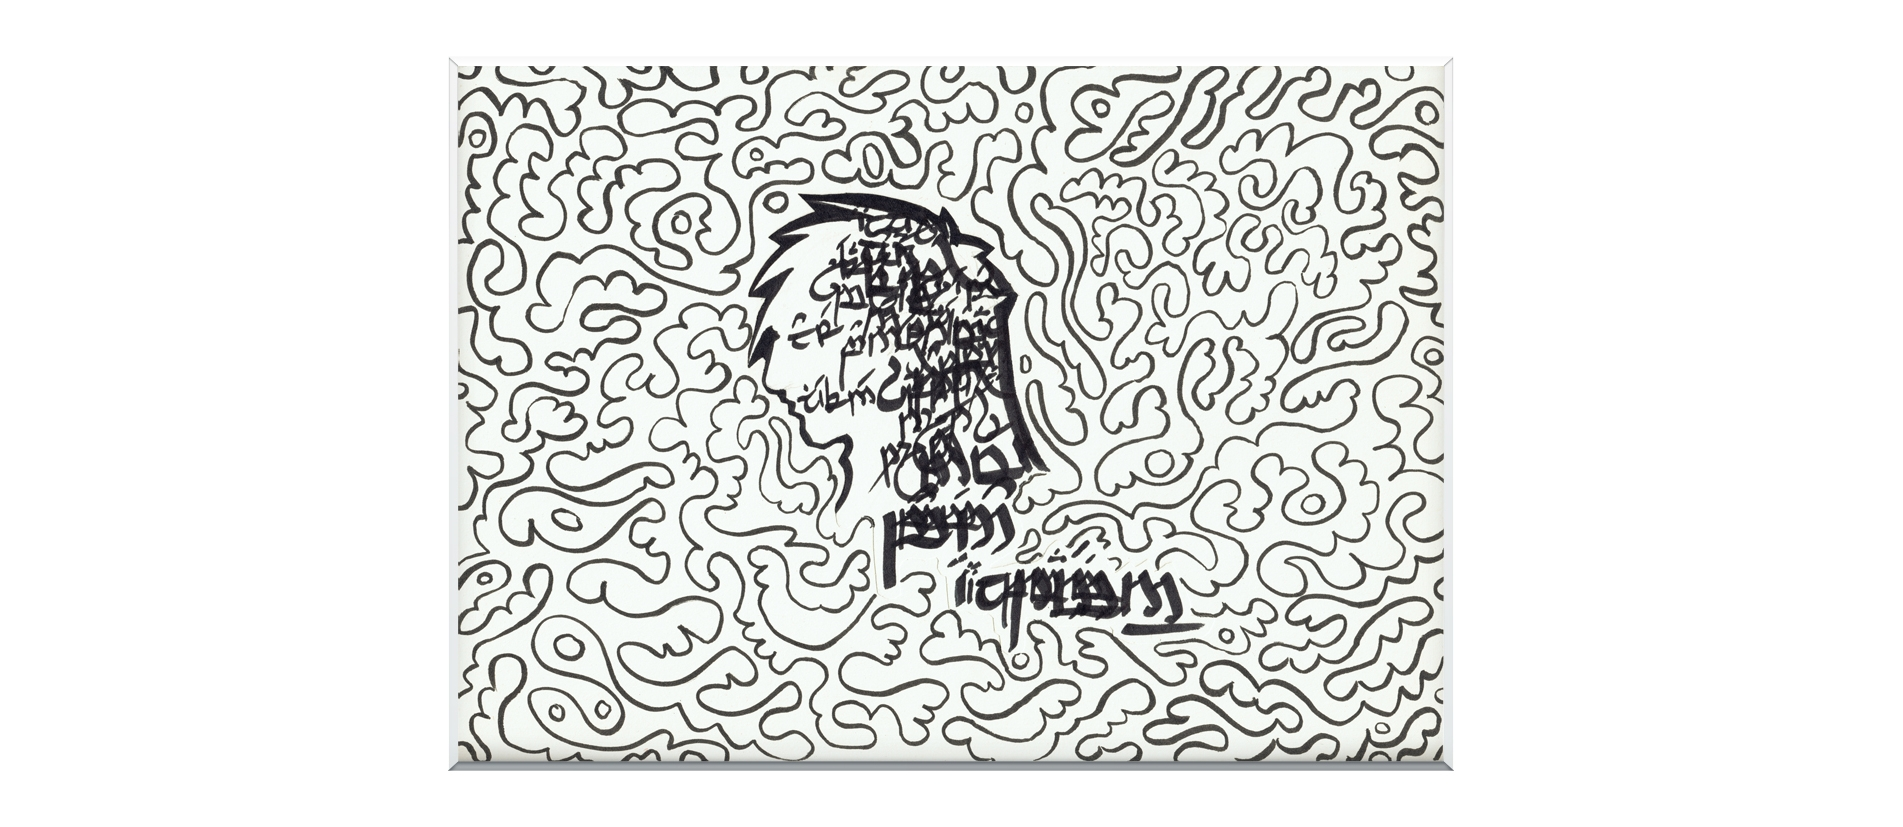 Reza - The Cloudhatched Beginning - Bono Mourits